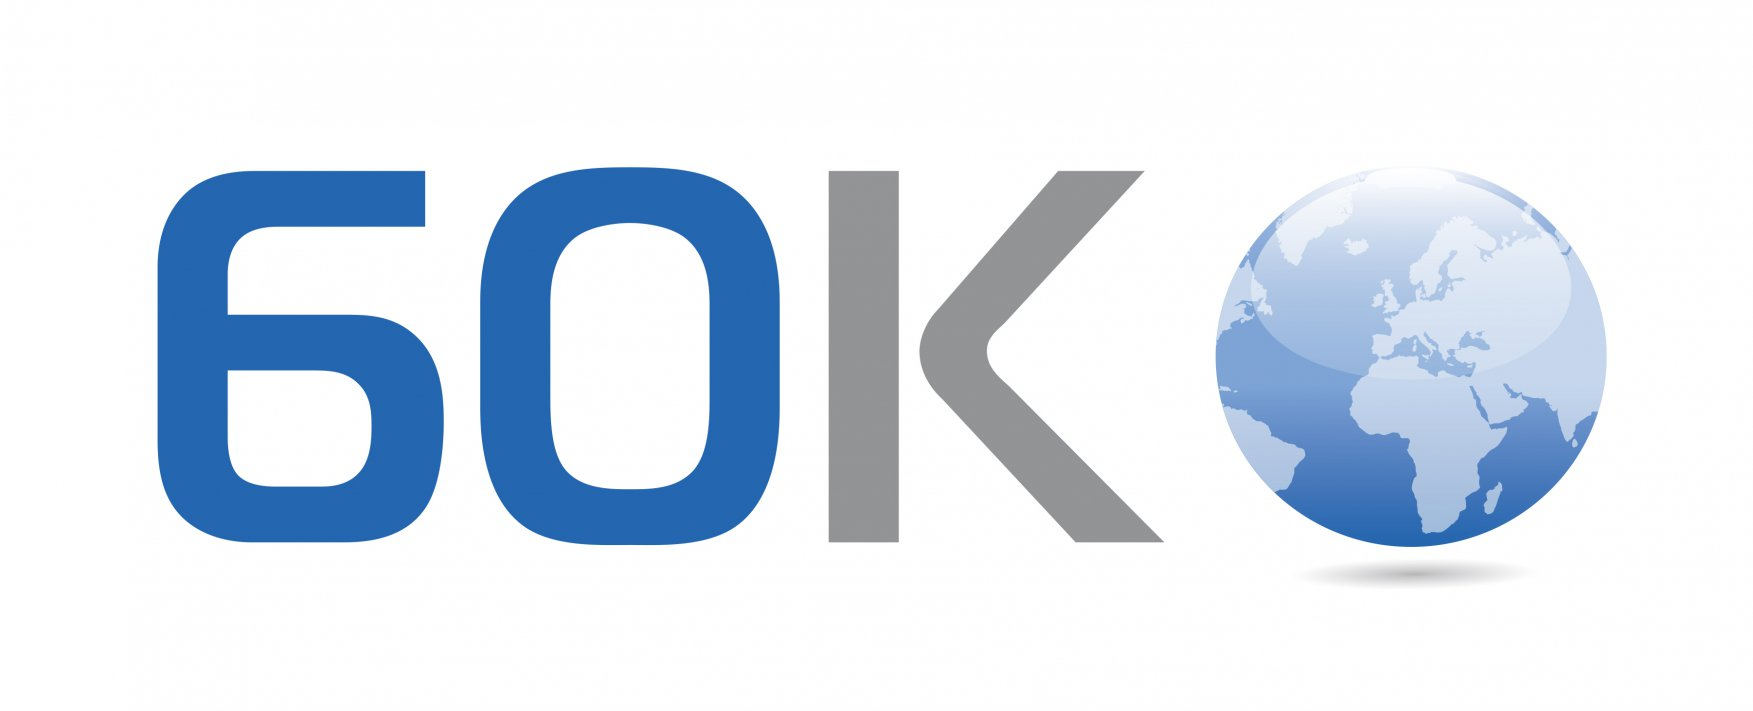 60К (Sixty K) logo